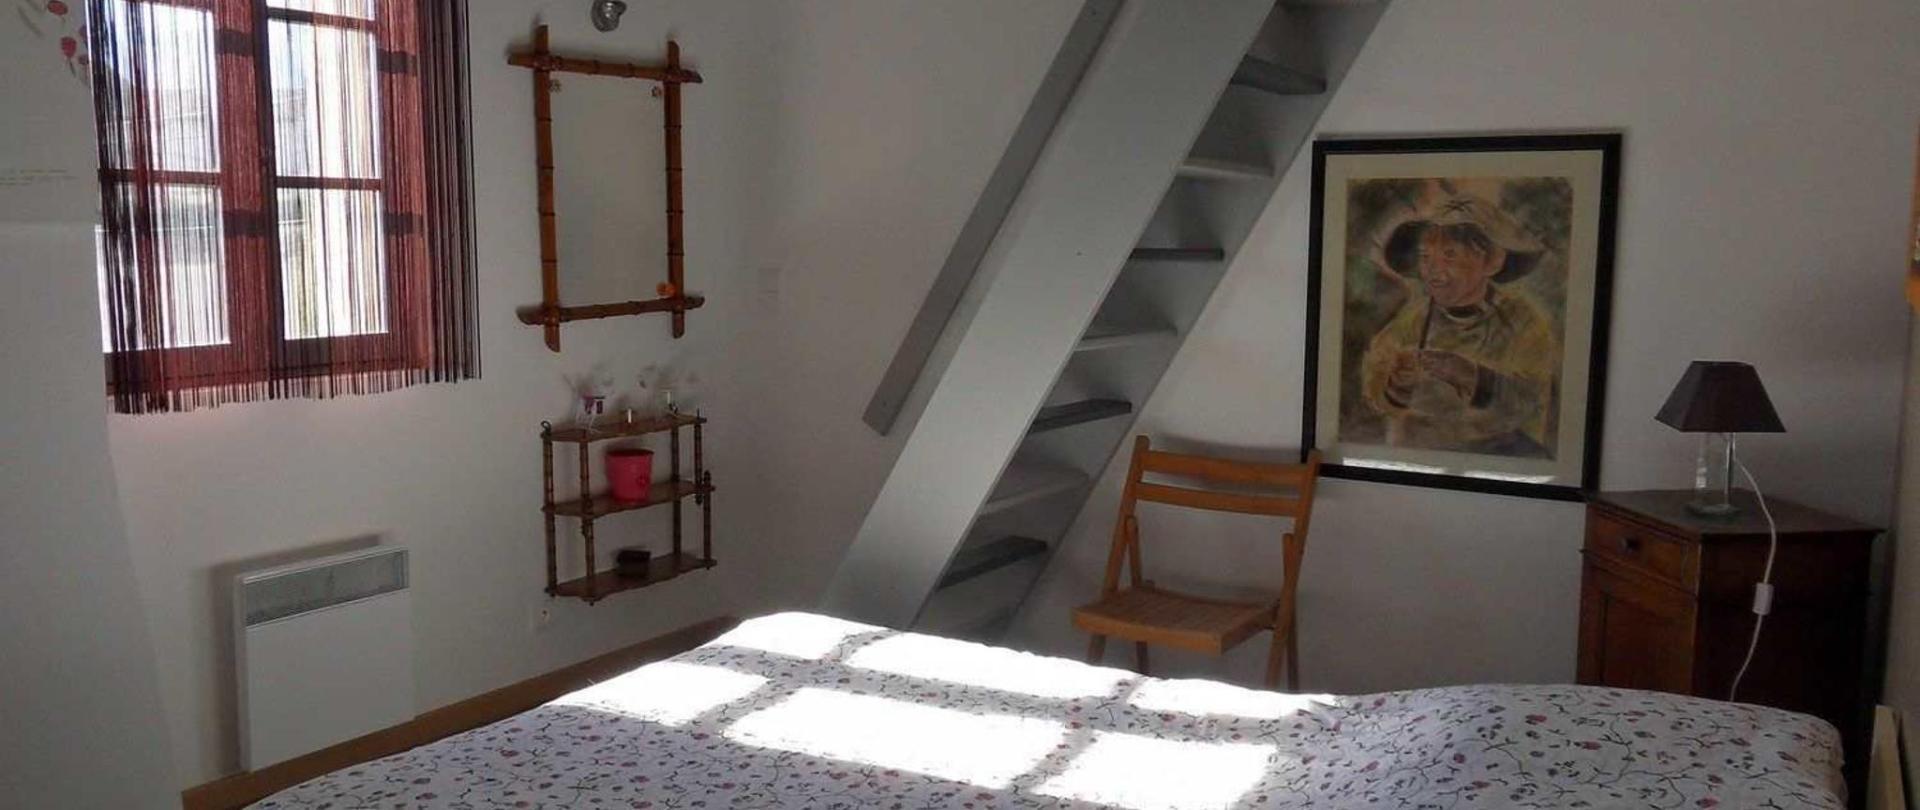 chambre-camomille-en-duplex-1.jpg